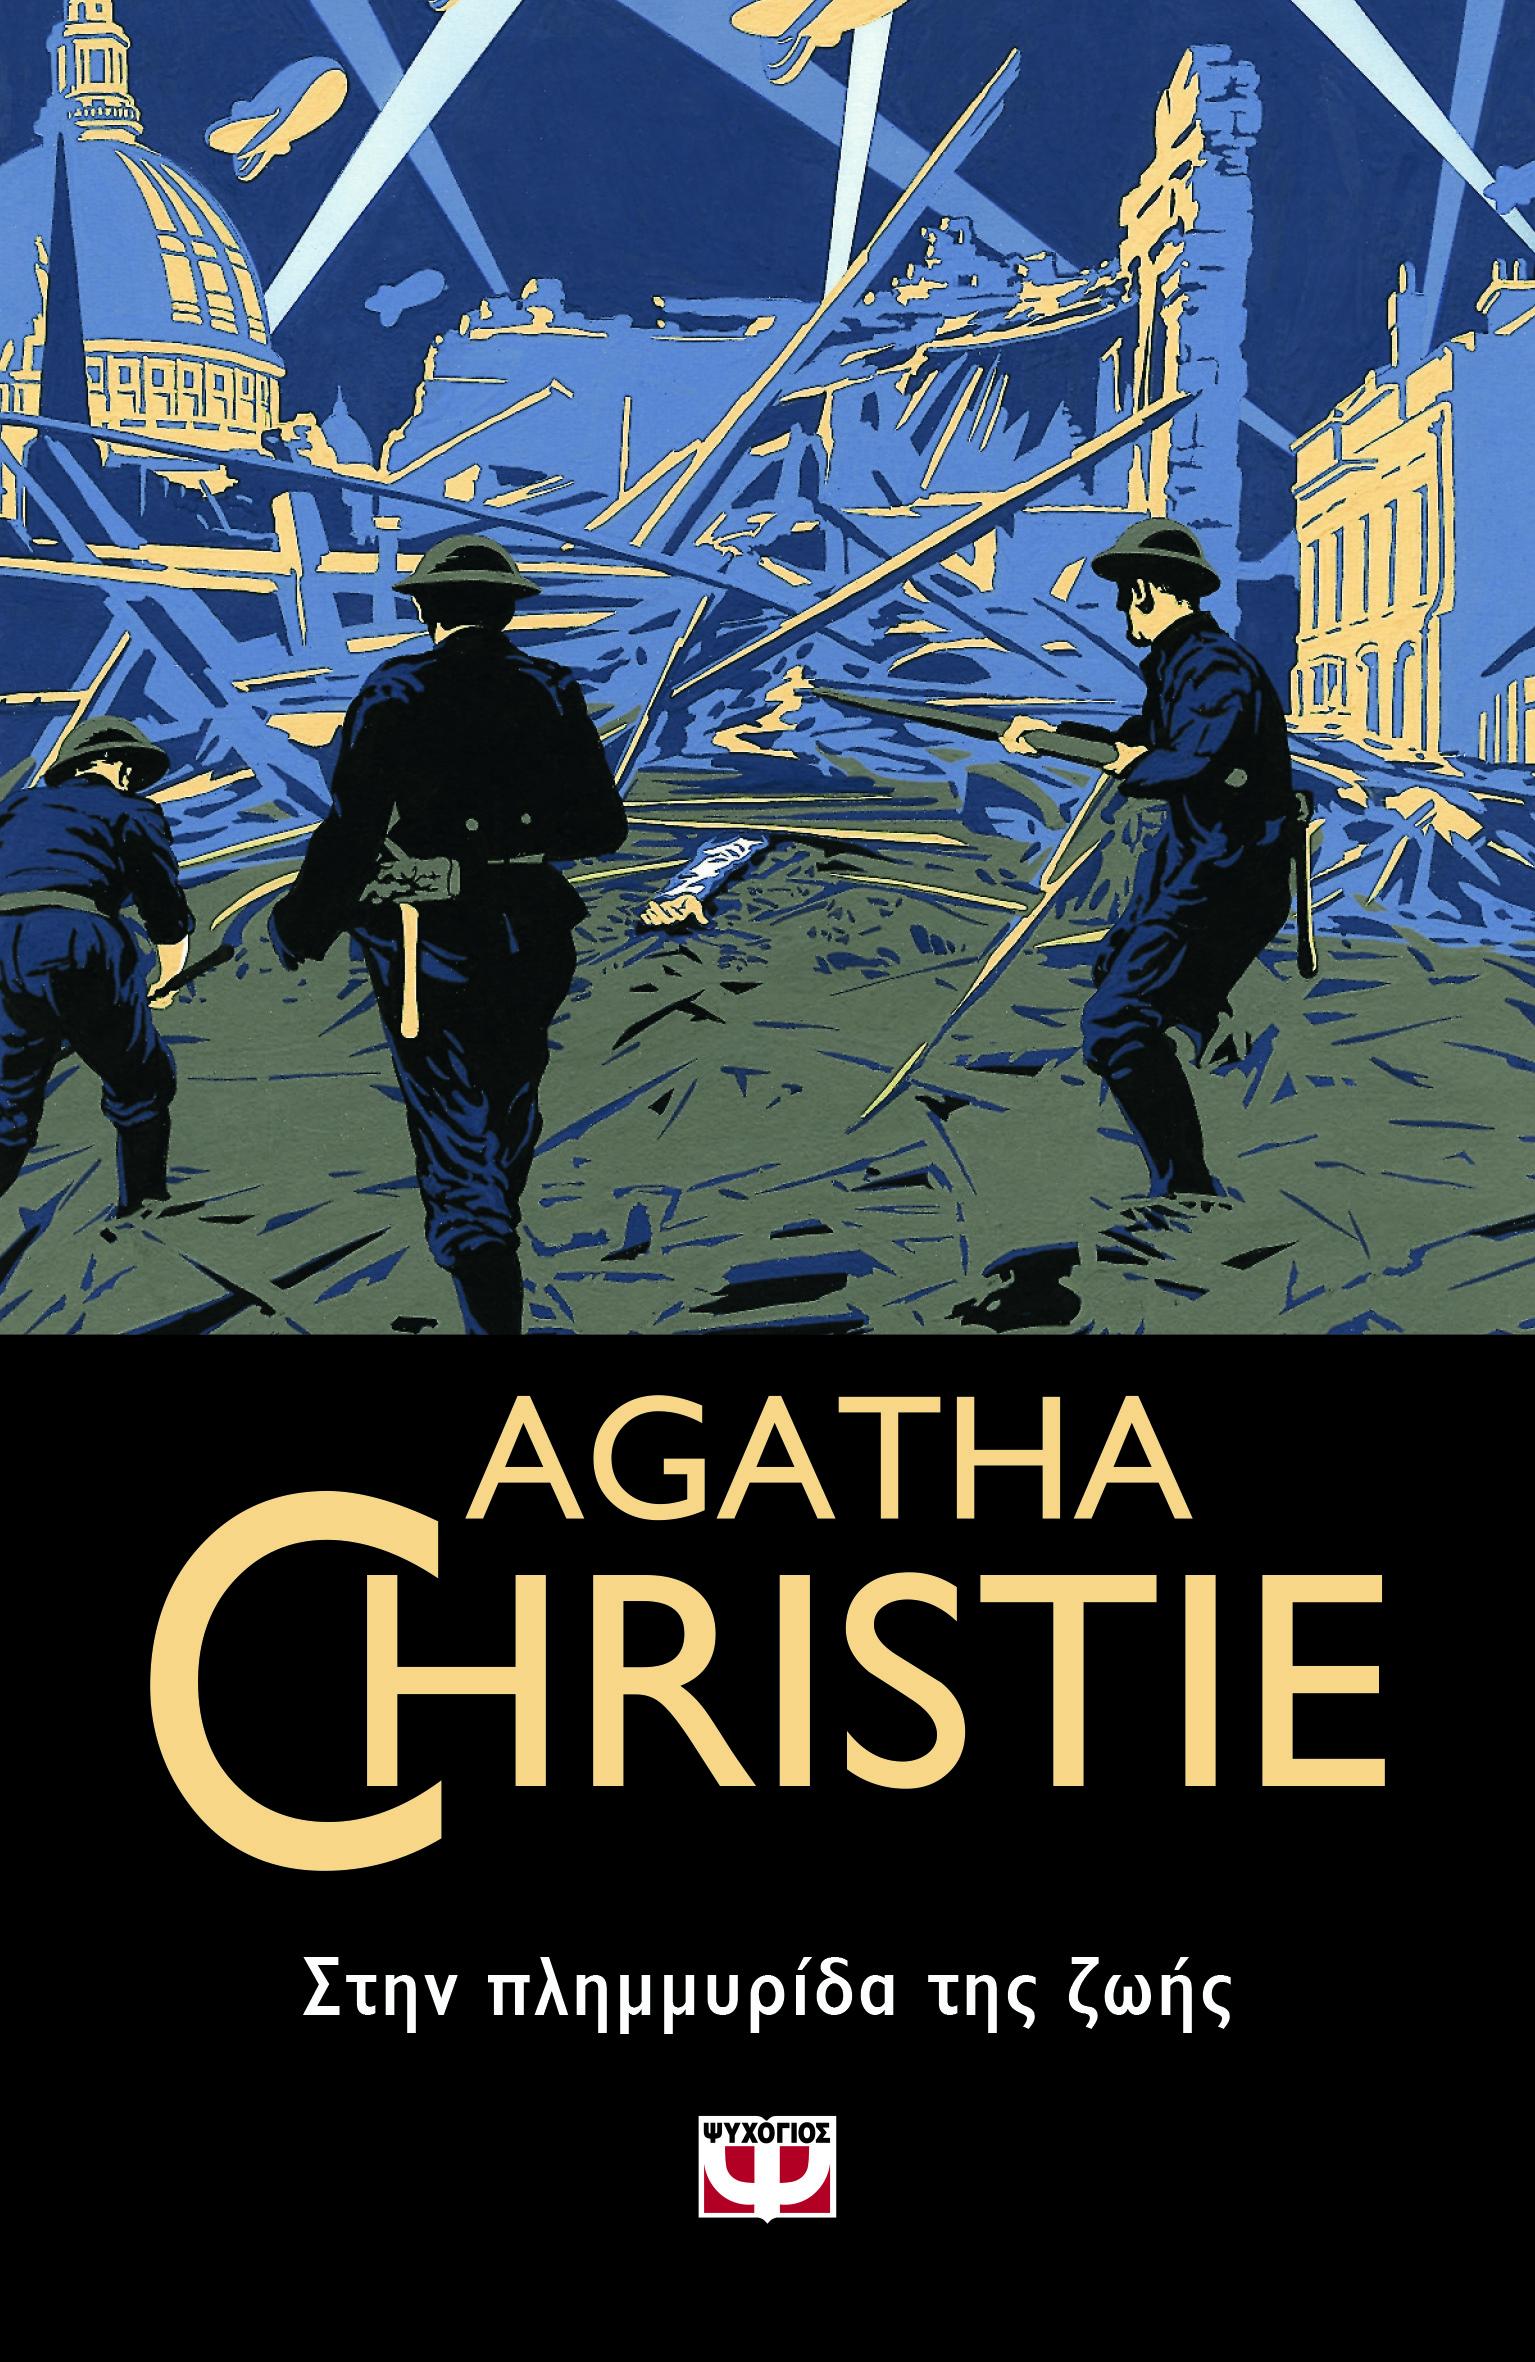 AGATHA CHRISTIE:ΣΤΗΝ ΠΛΗΜΜΥΡΙΔΑ ΤΗΣ ΖΩΗΣ